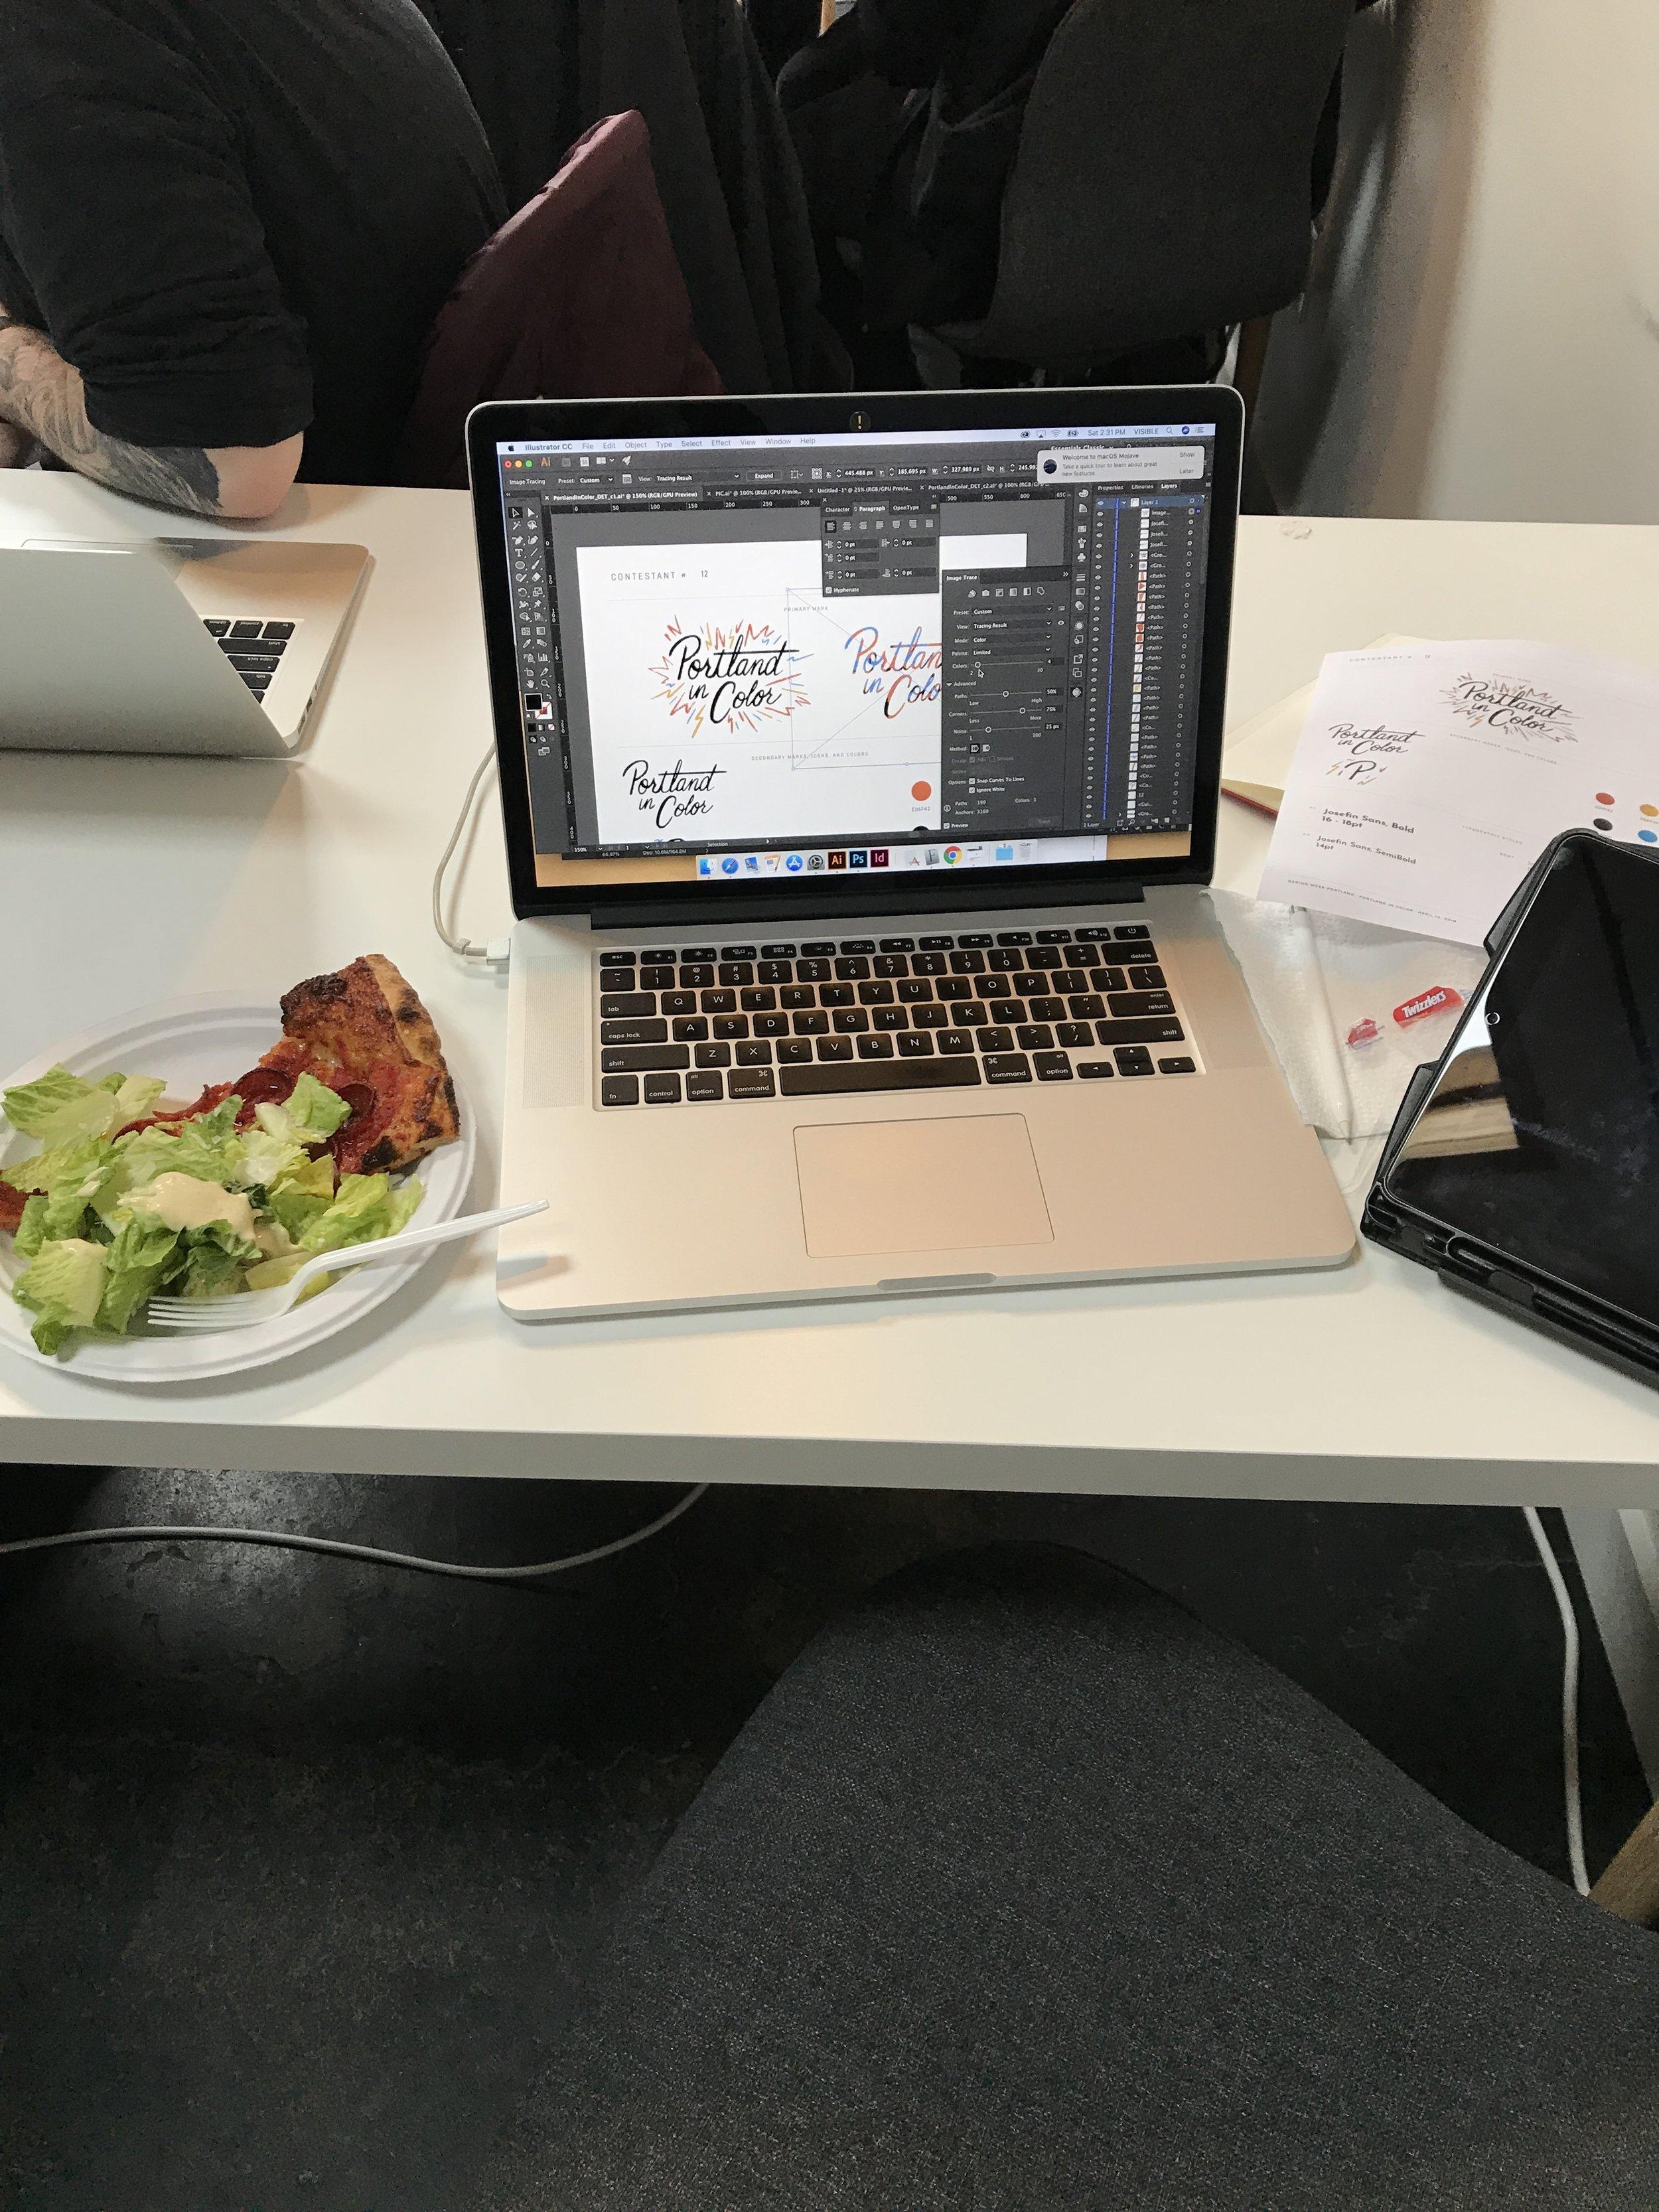 Brand design + pizza: a winning combo.